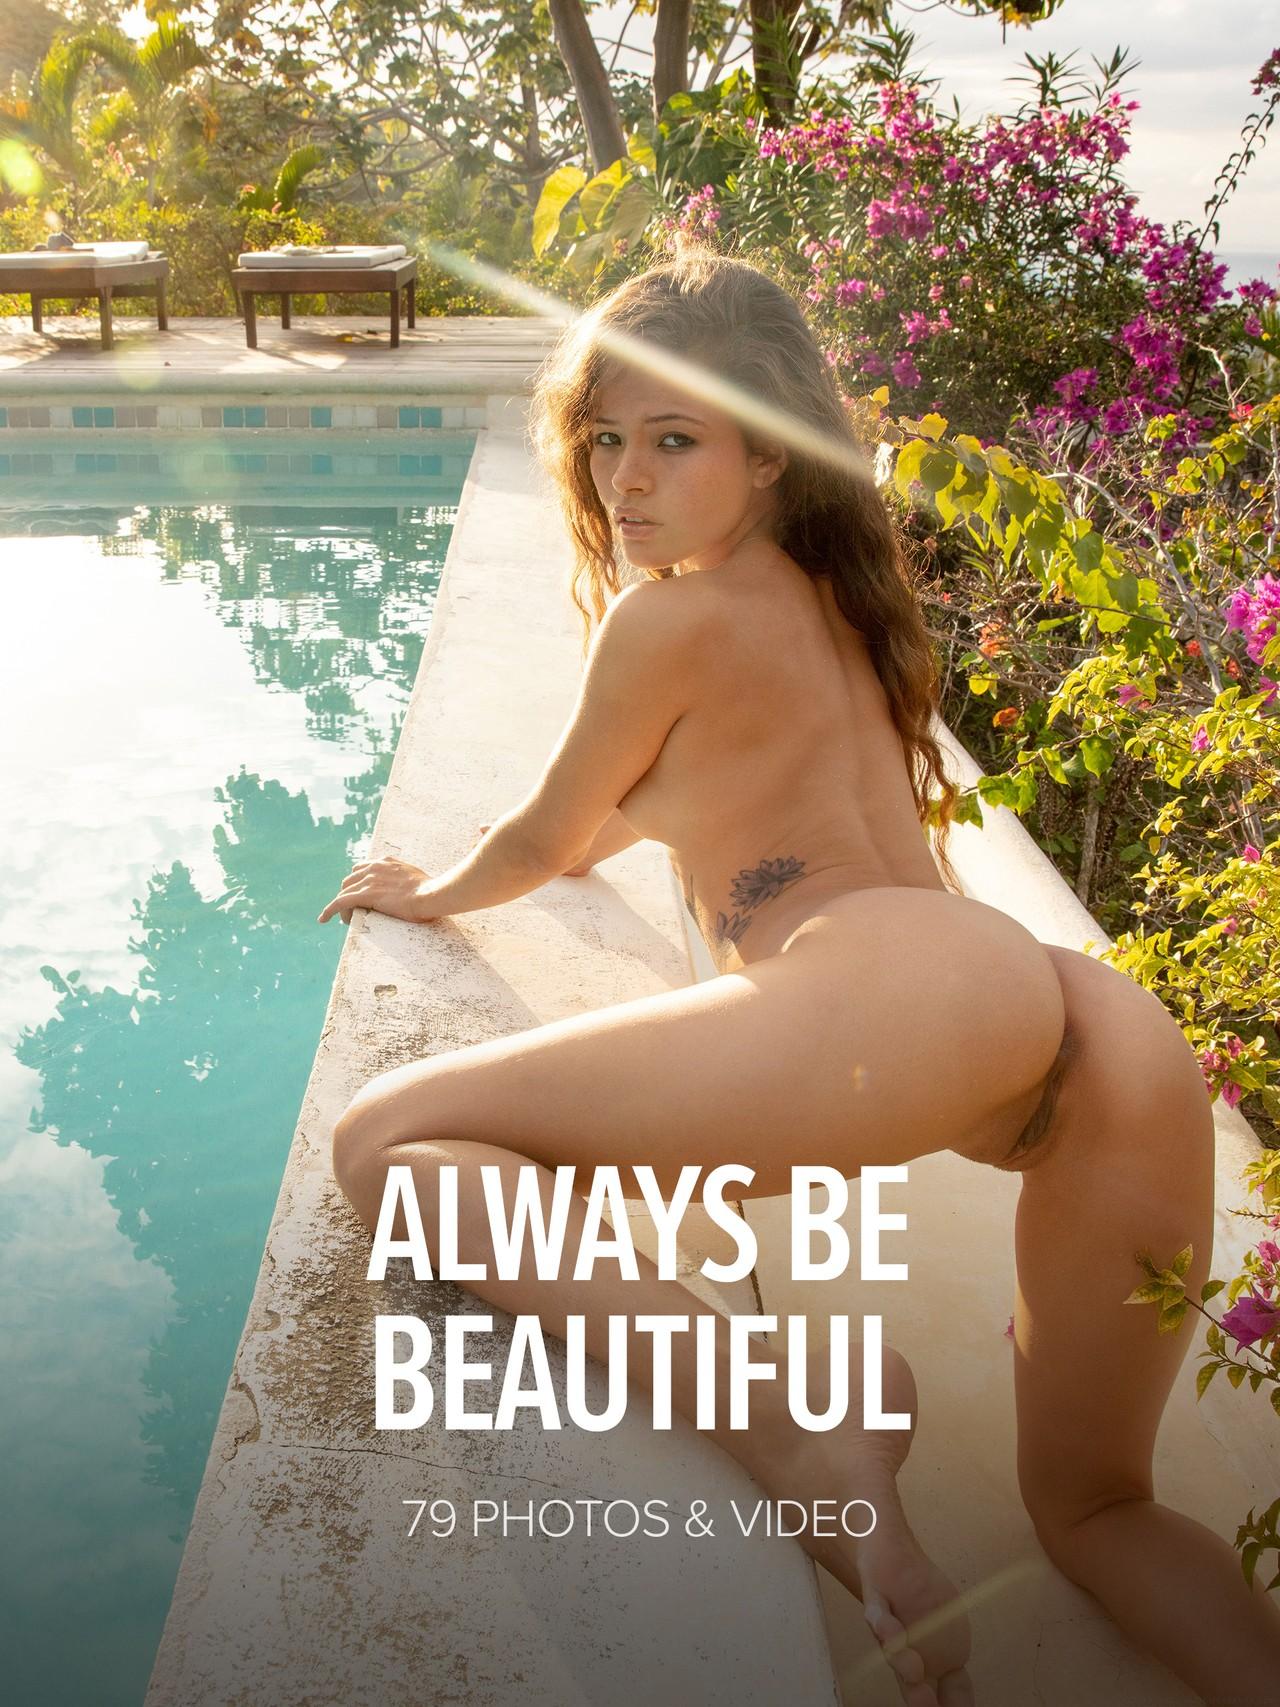 Irene Rouse: Always Be Beautiful